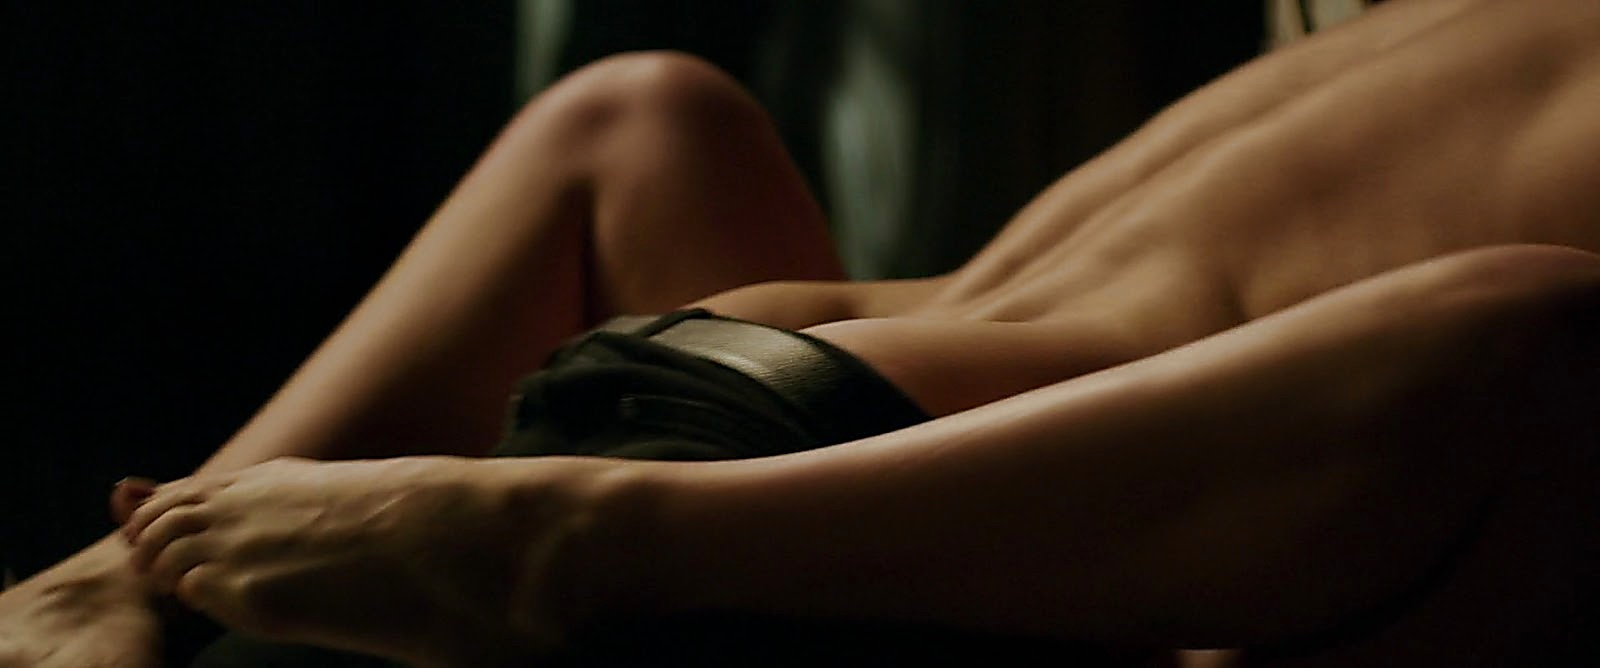 Jamie Dornan sexy shirtless scene April 6, 2017, 6am